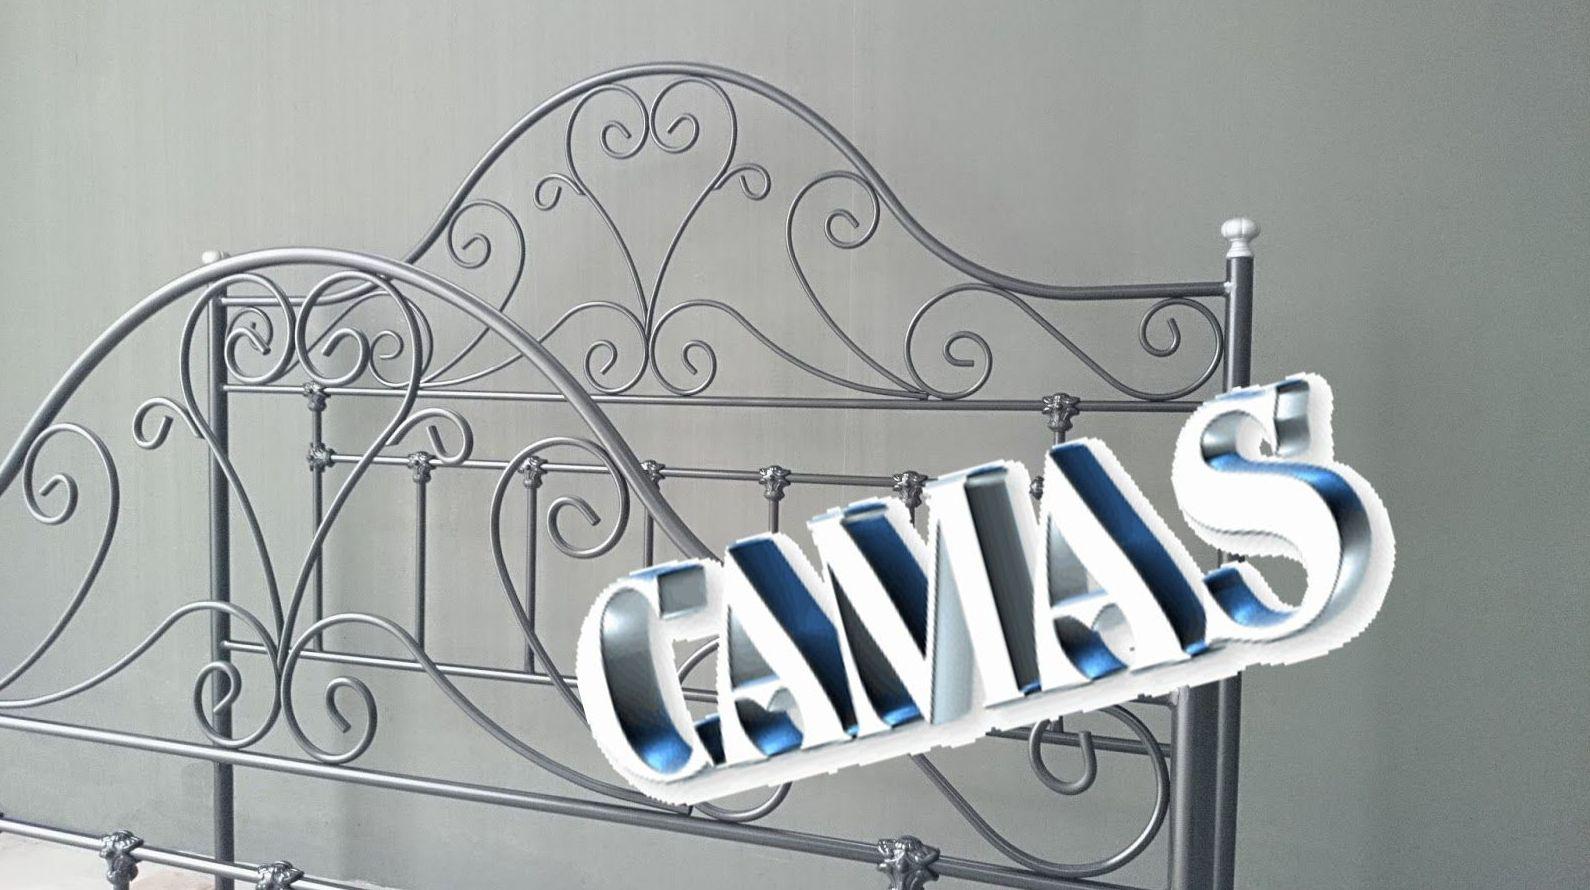 CAMAS ENTERAS: Catálogo de muebles de forja de Forja Manuel Jiménez